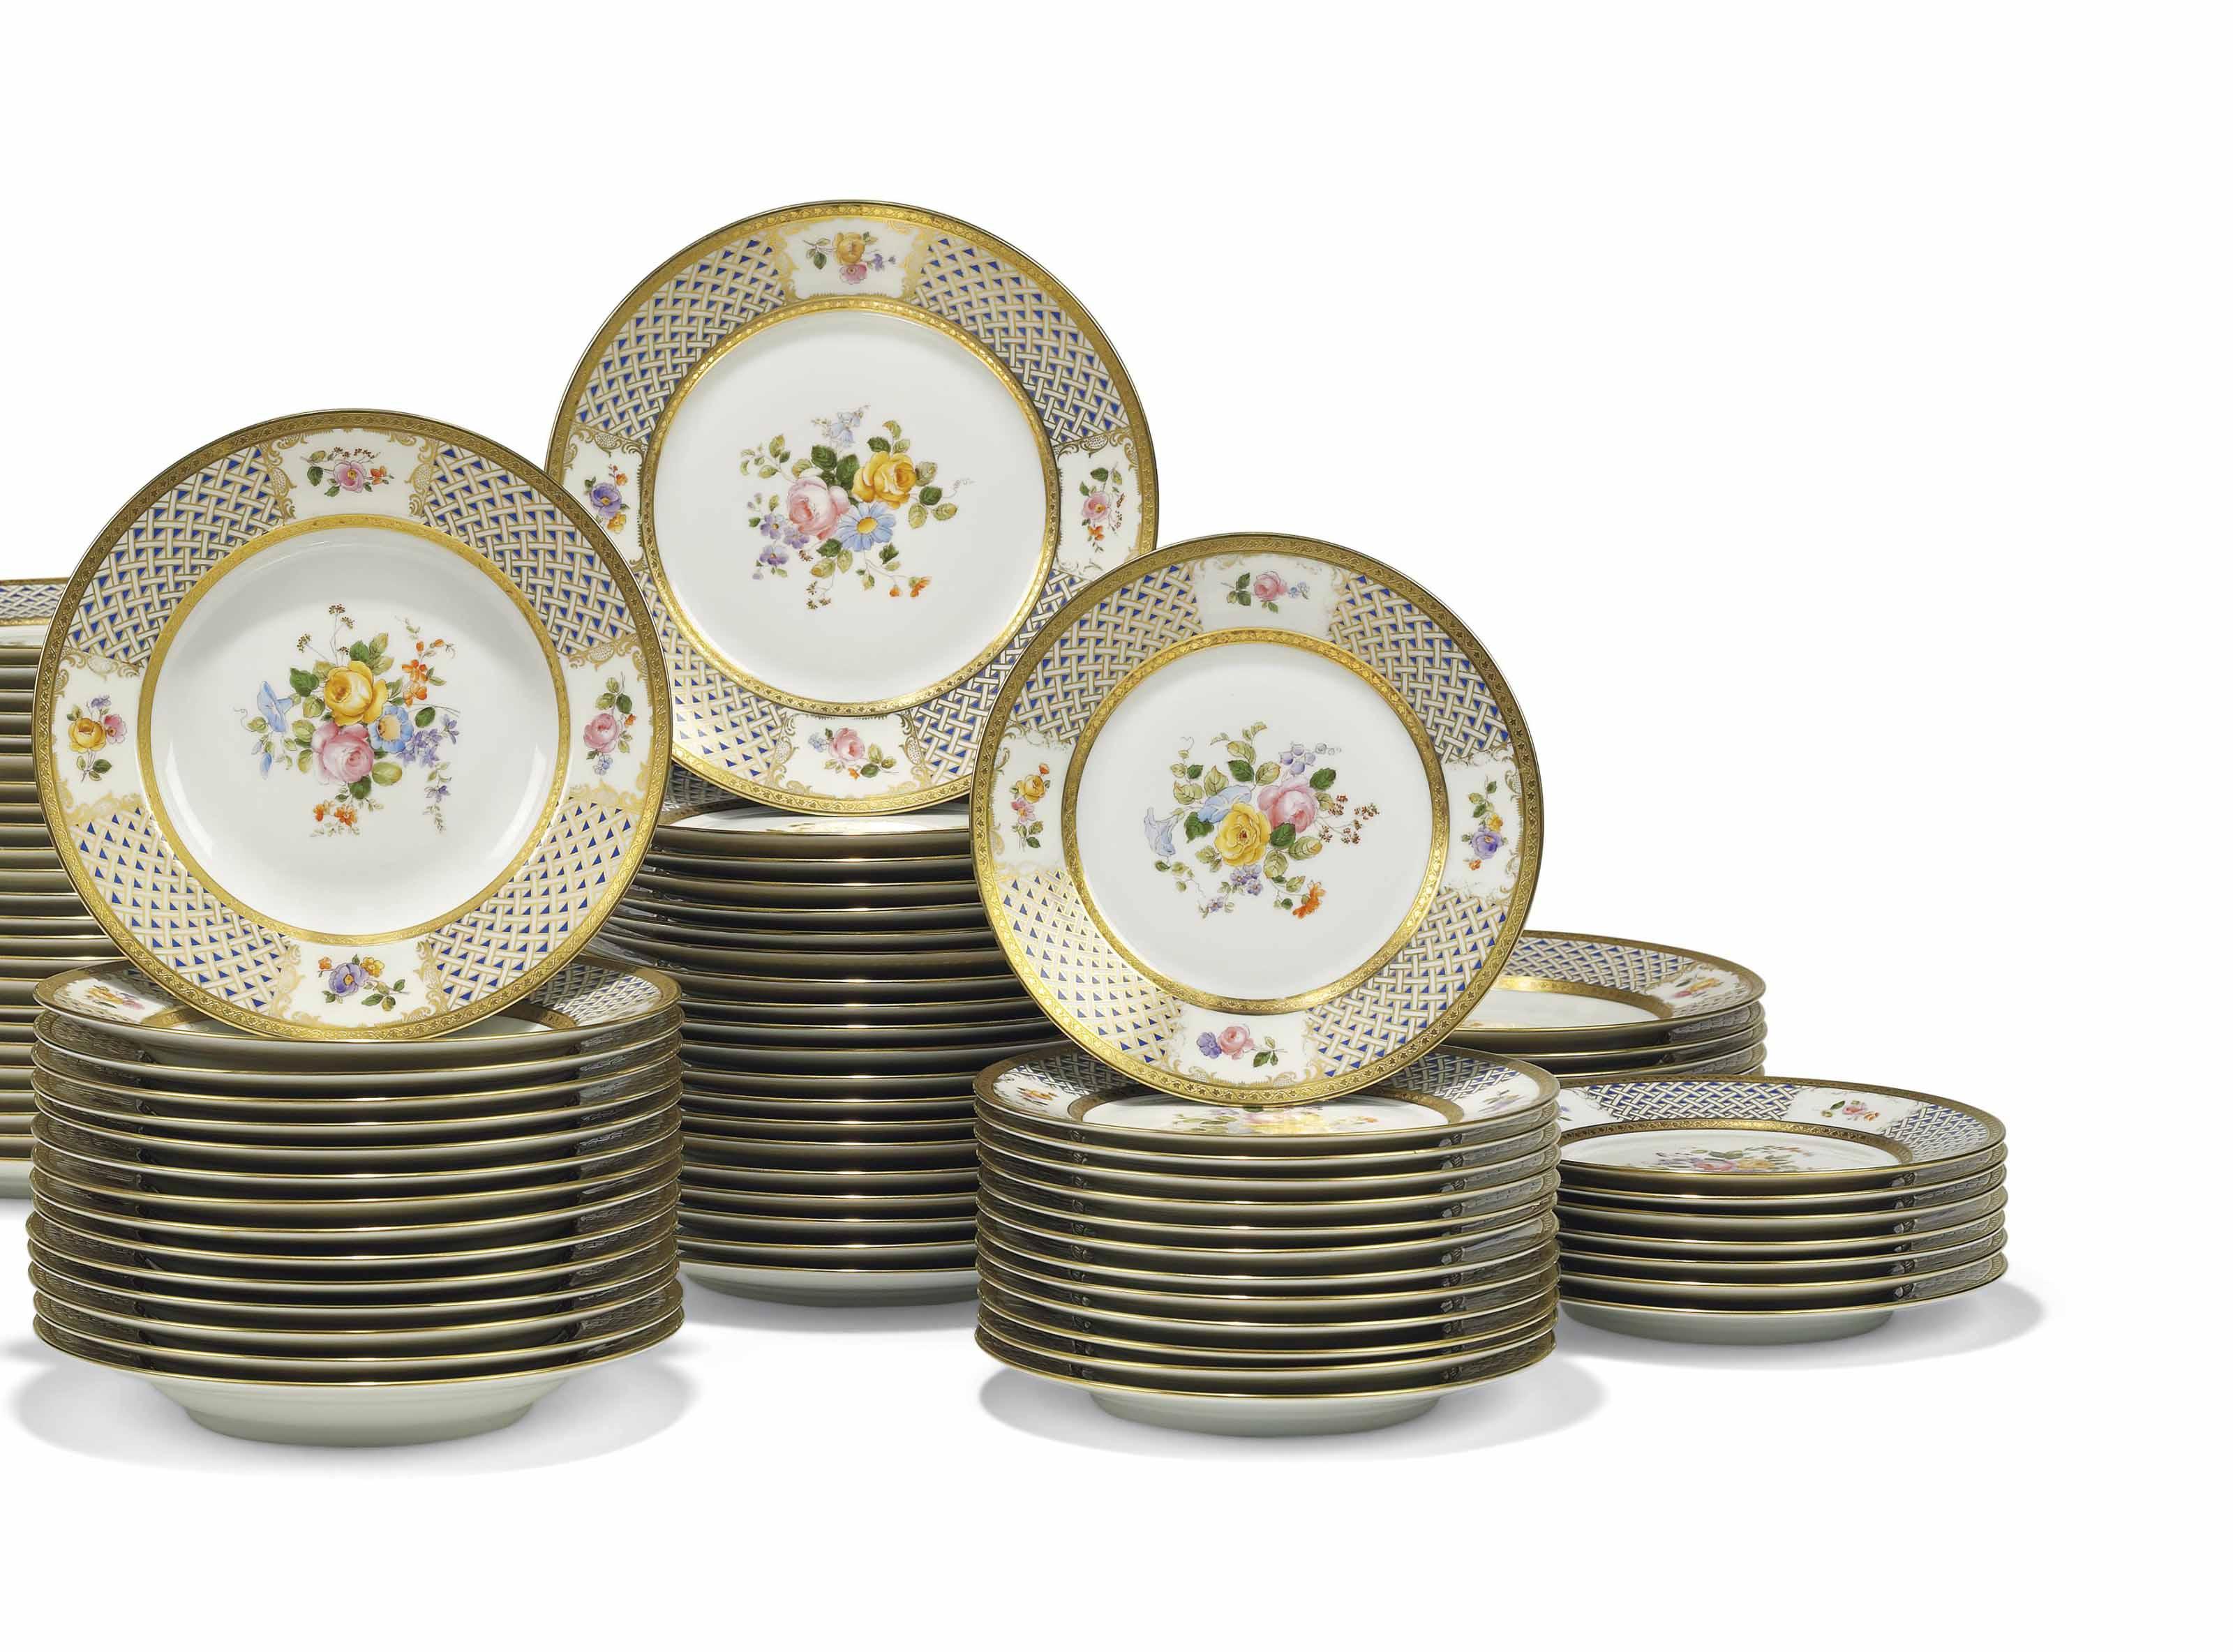 A RICHARD GINORI PART DINNER-SERVICE